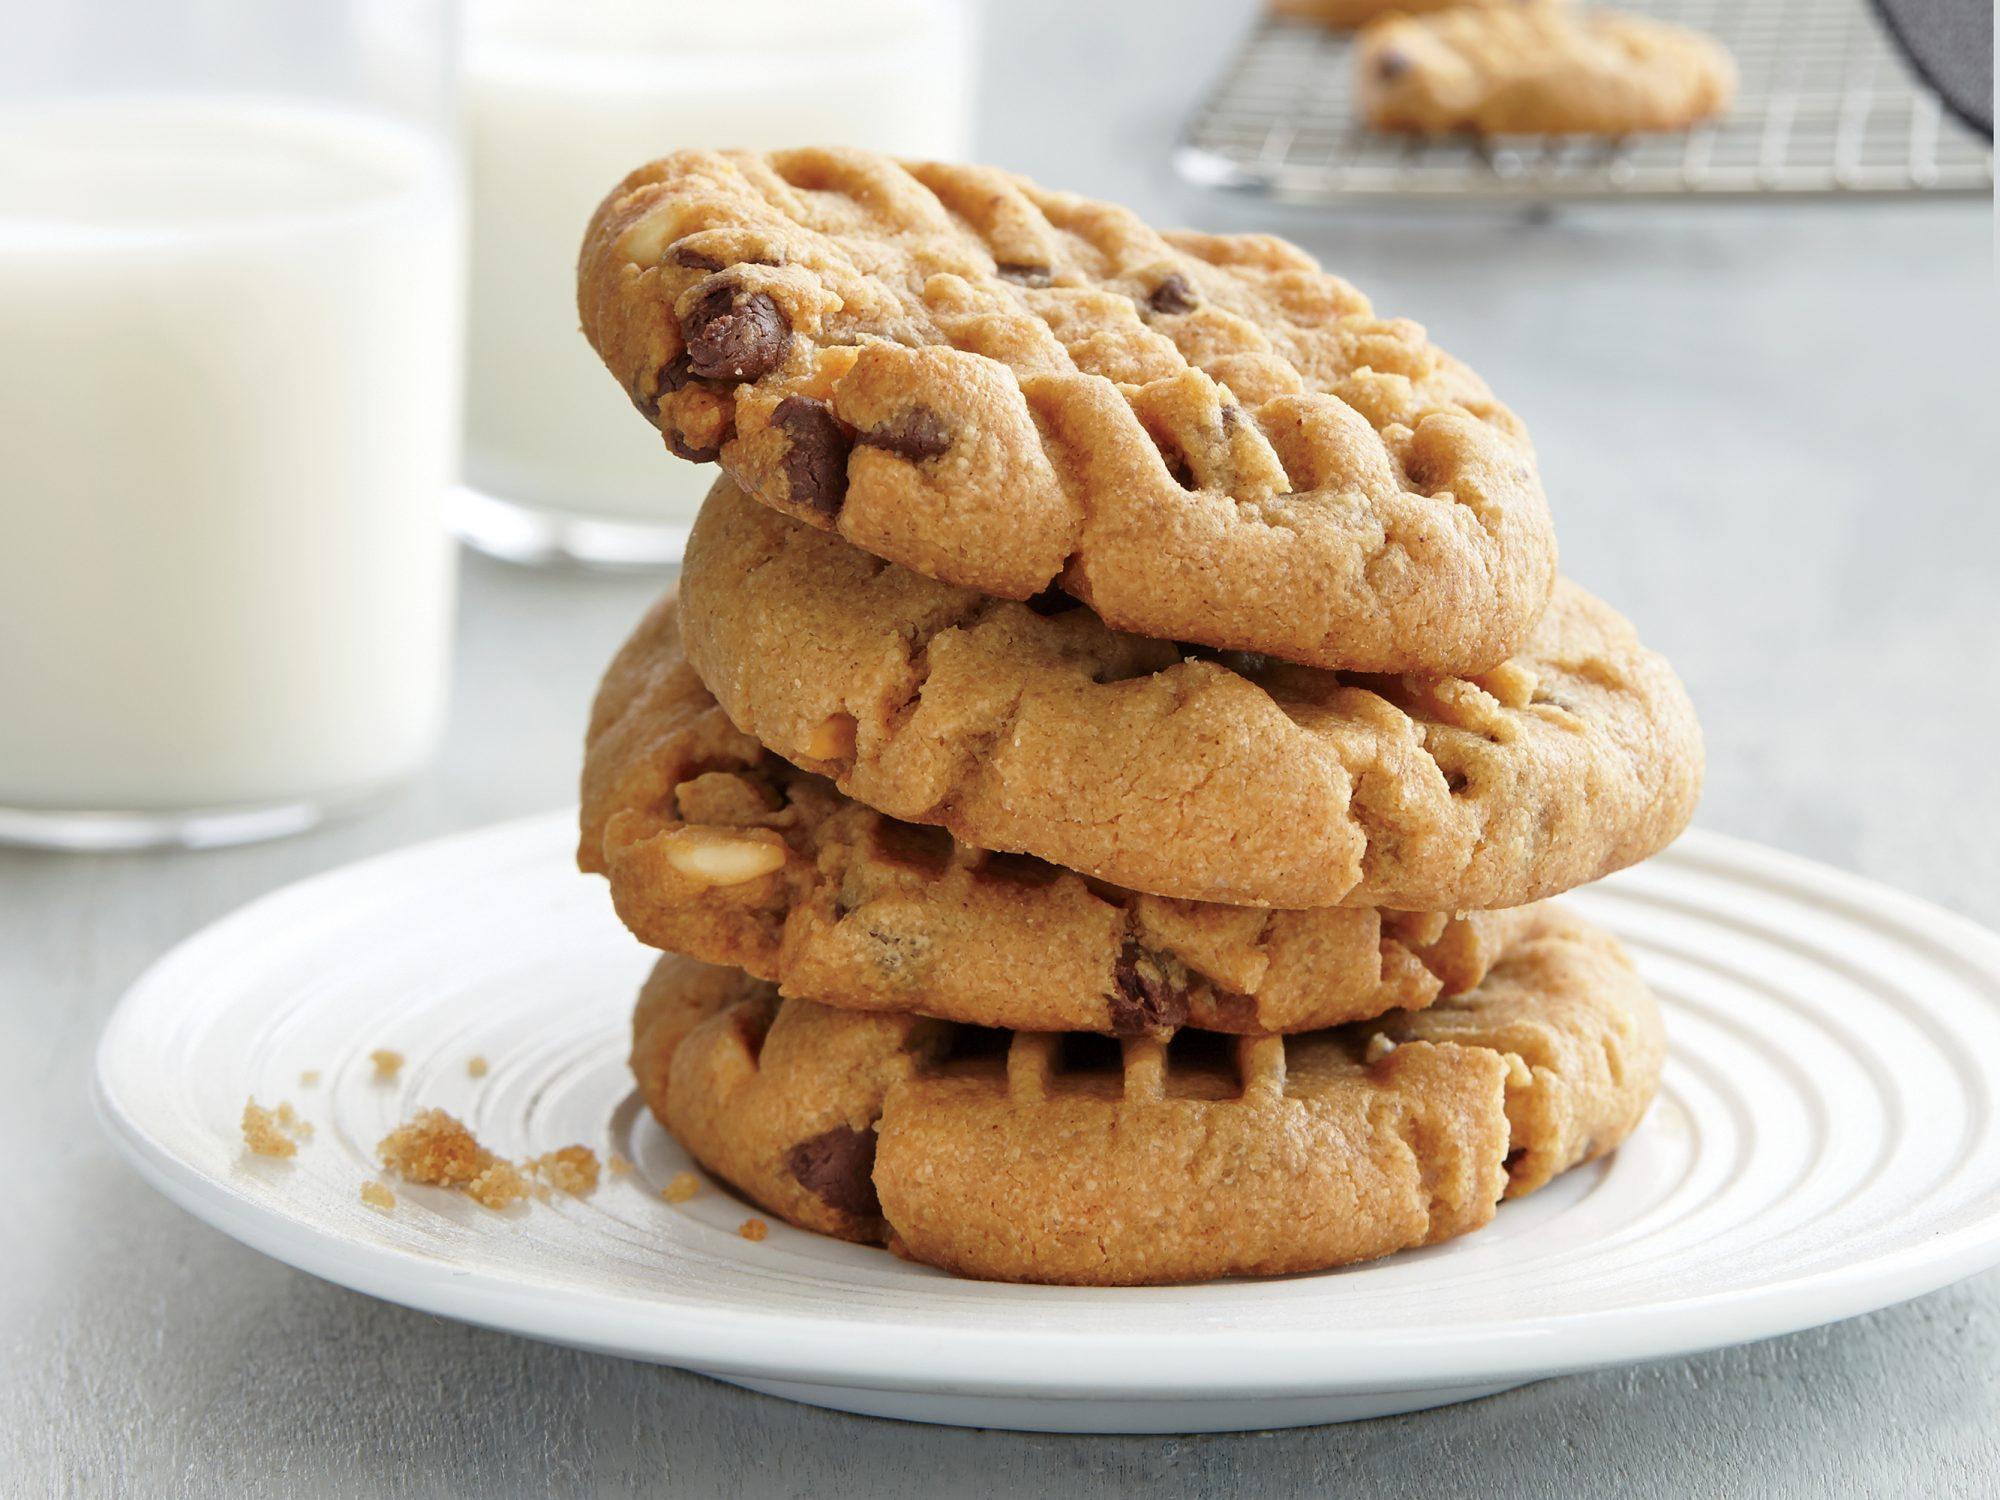 Gluten-Free Peanut Butter Chocolate Chip Cookies